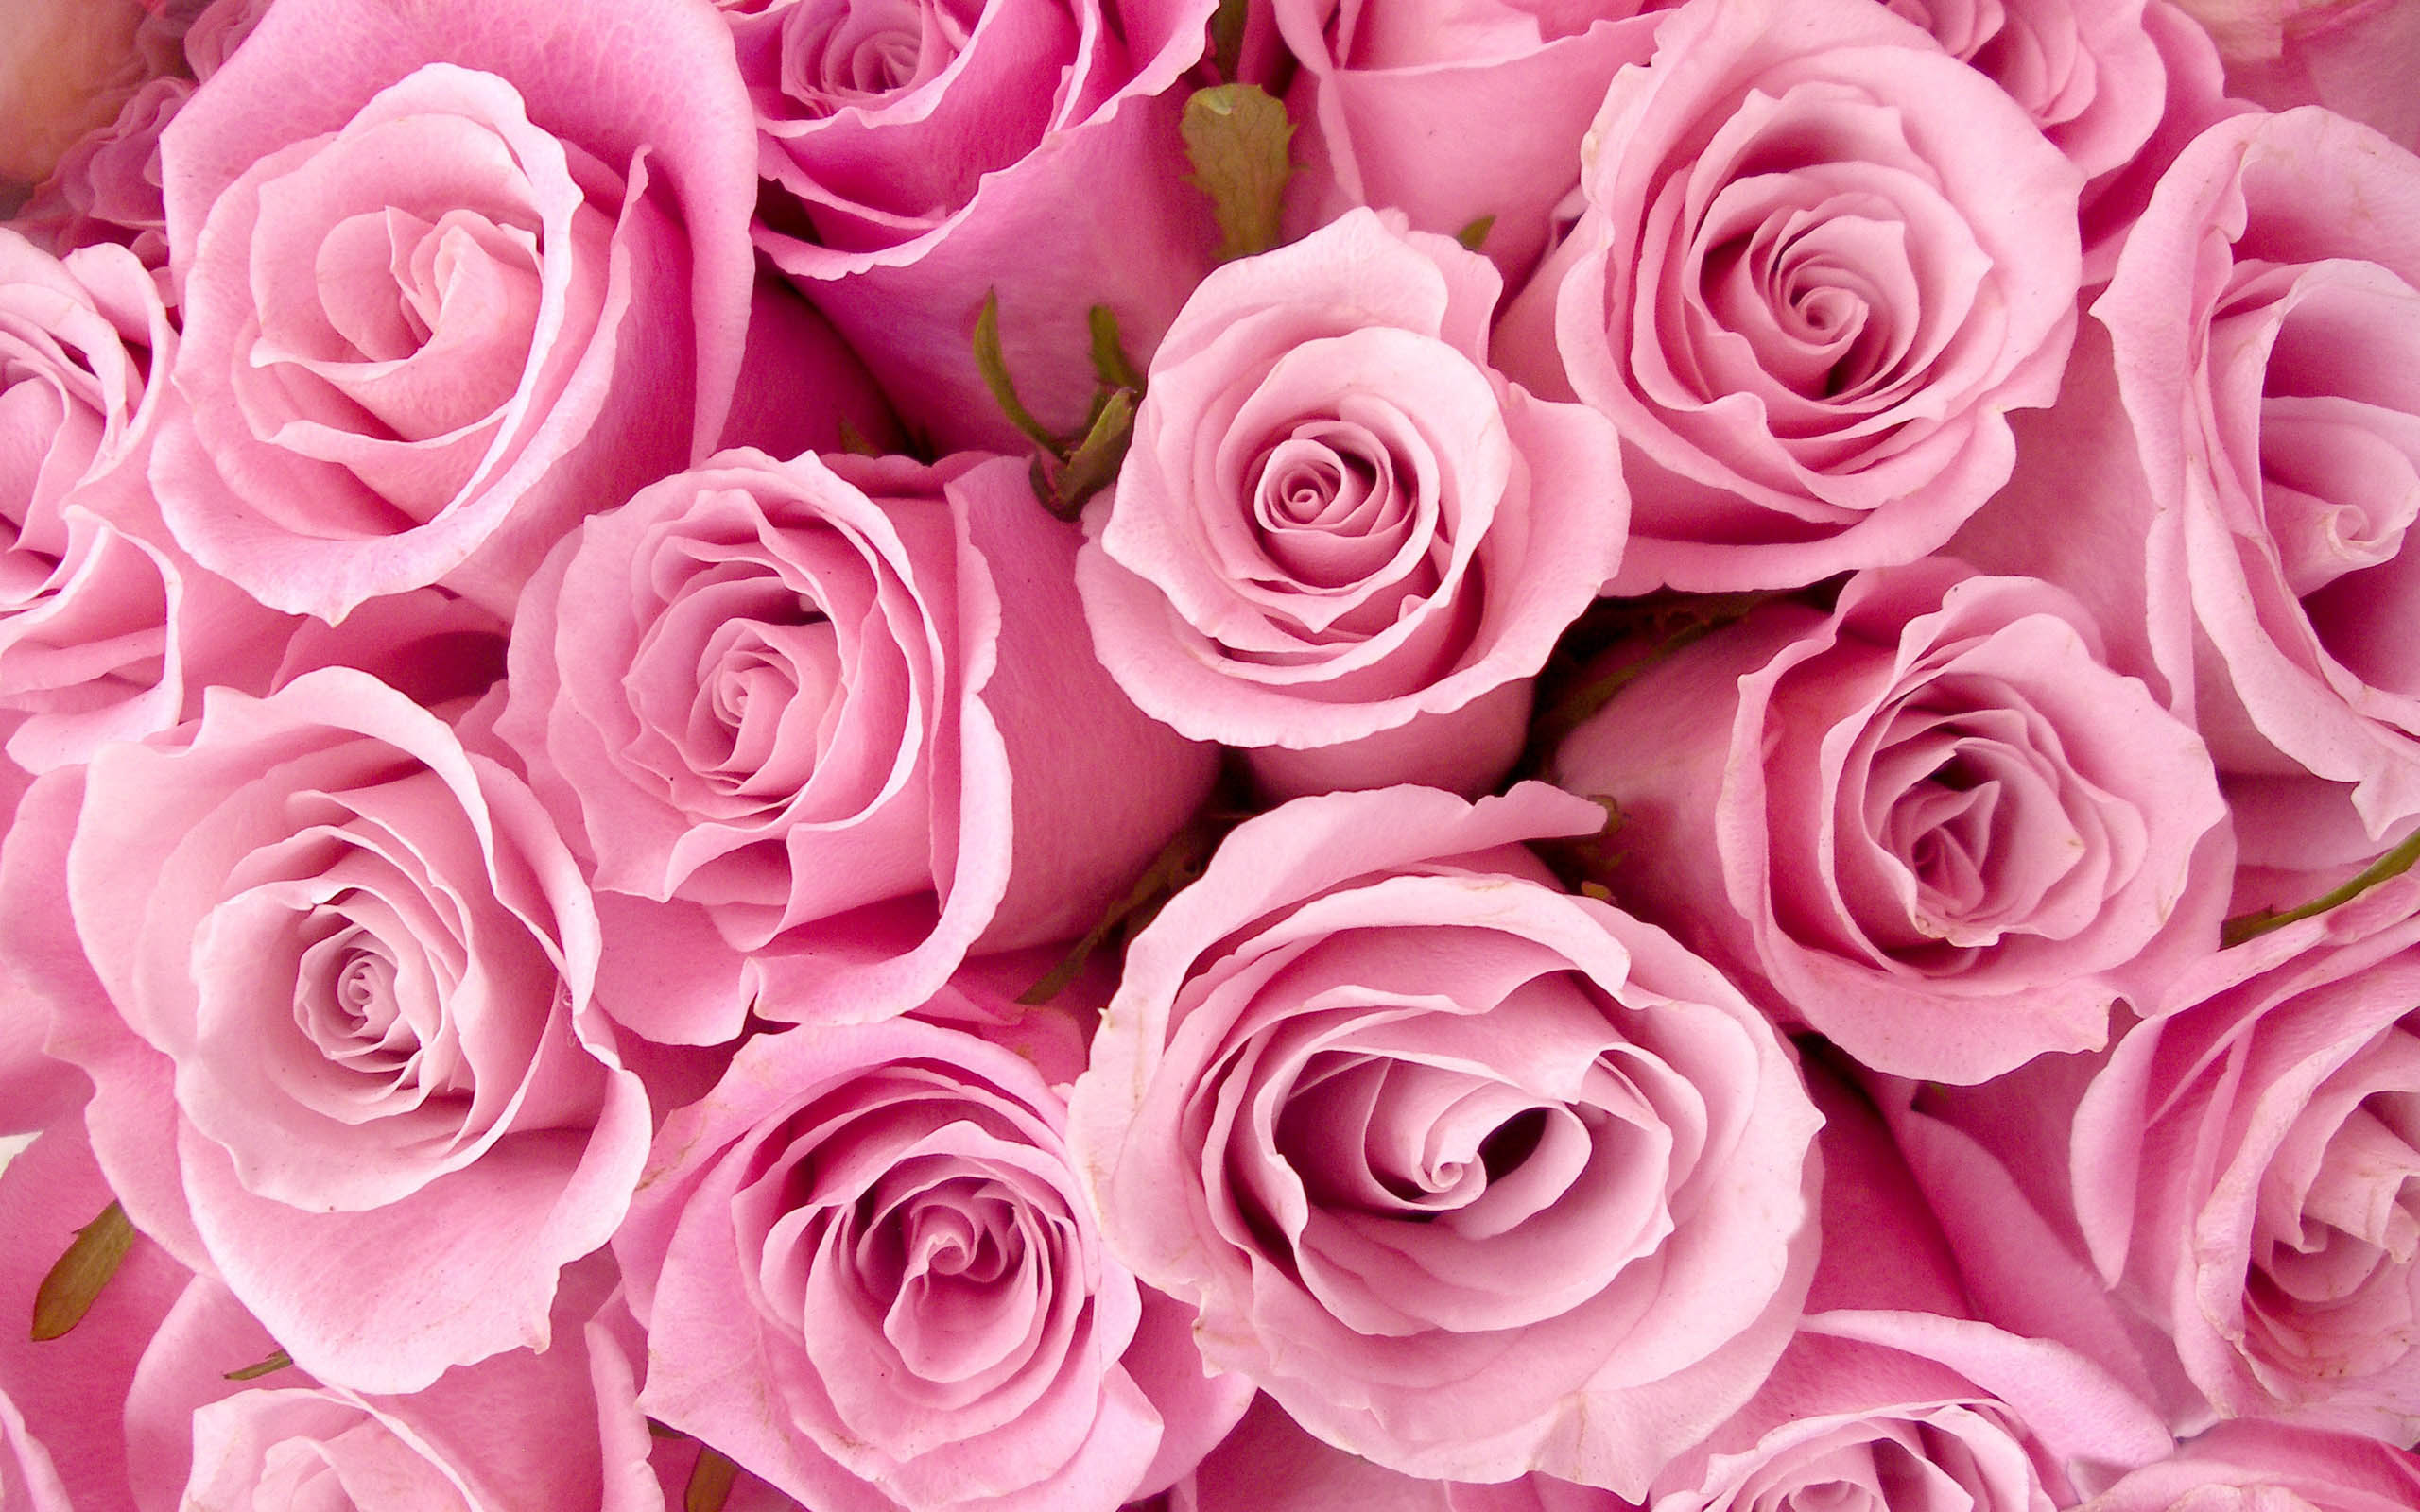 Pink roses wallpaper photos   Pink Wallpaper Designs 2560x1600